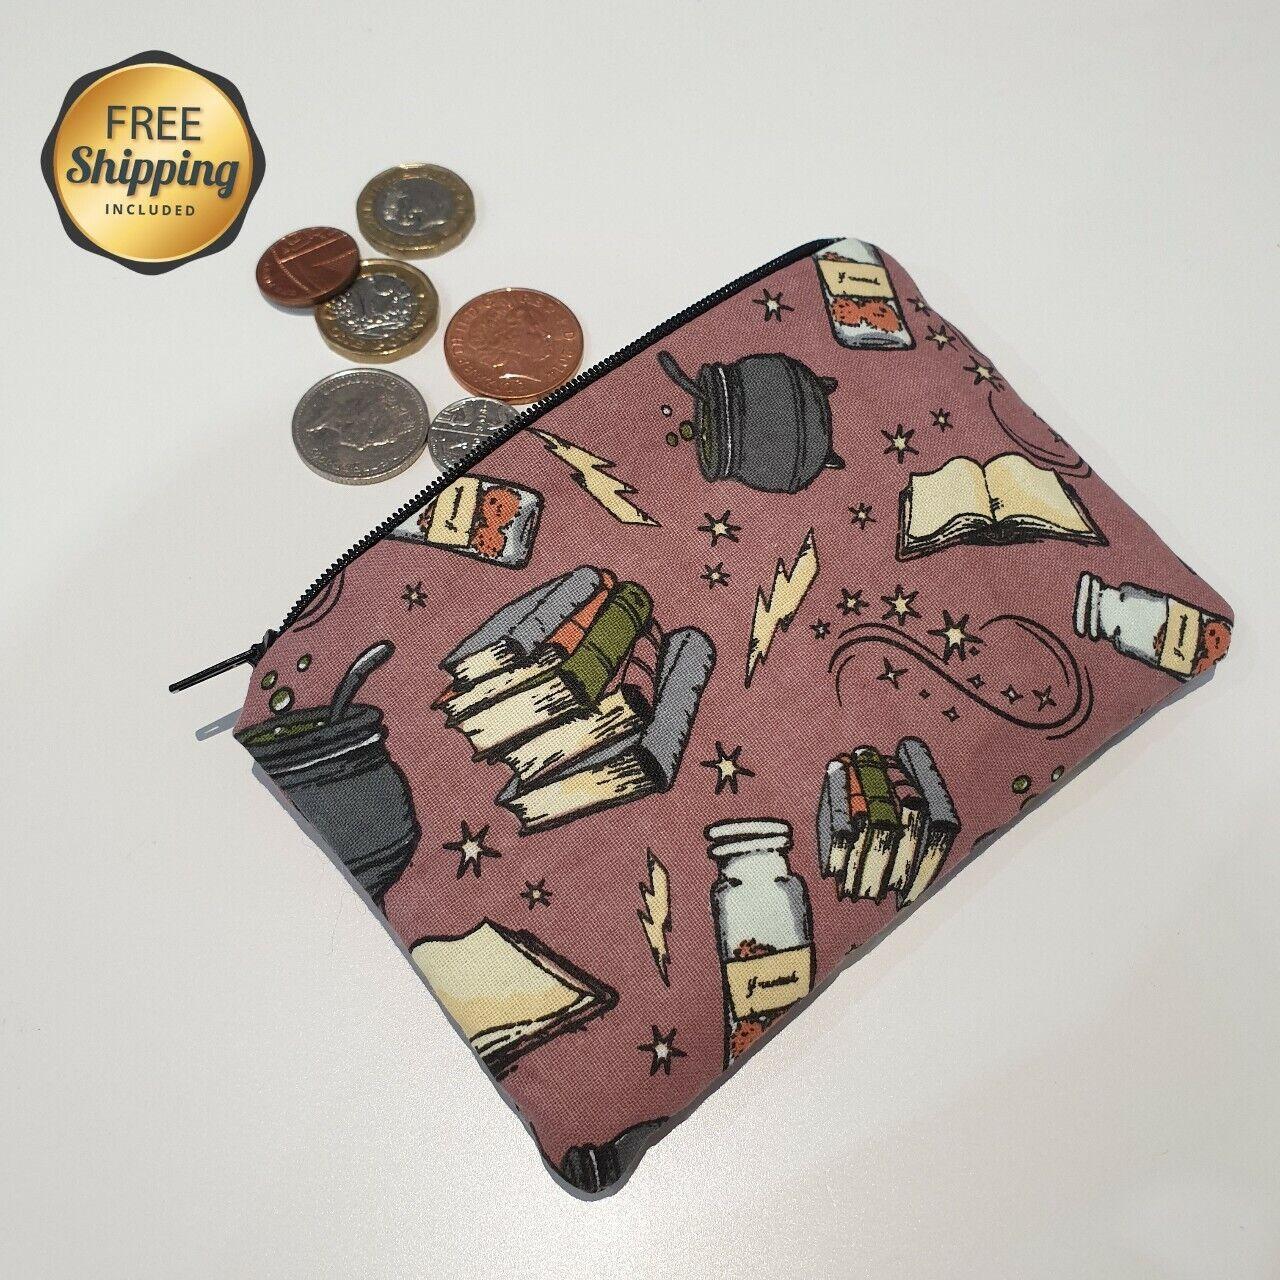 handmade harry potter purple magic coin purse pouch gift present